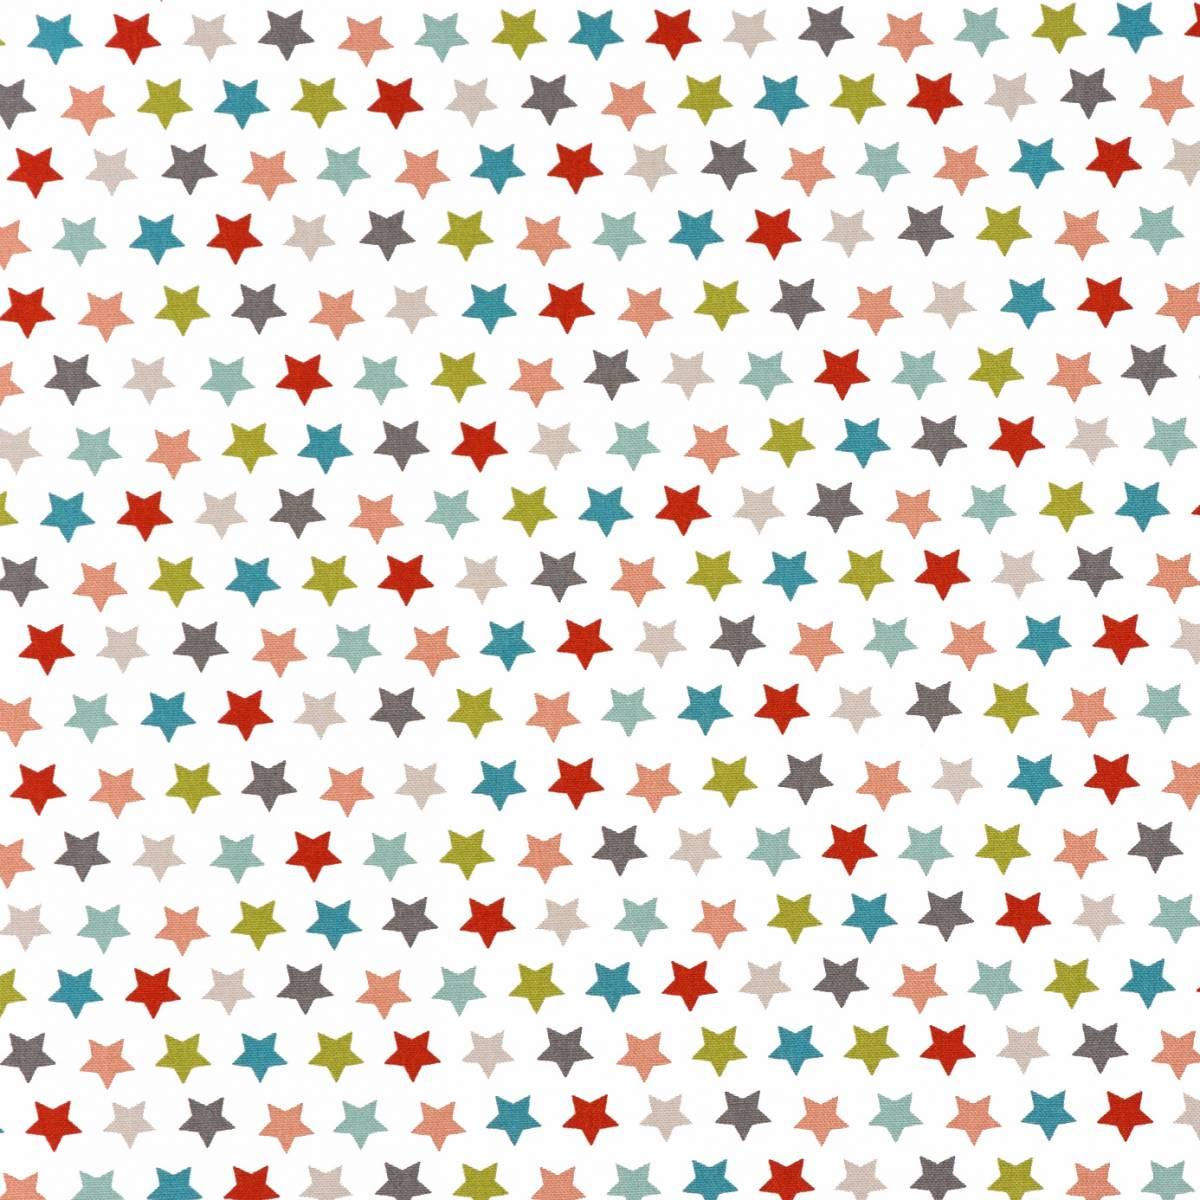 Galaxy fabric spice galaxyspice fryetts helix for Galaxy material fabric